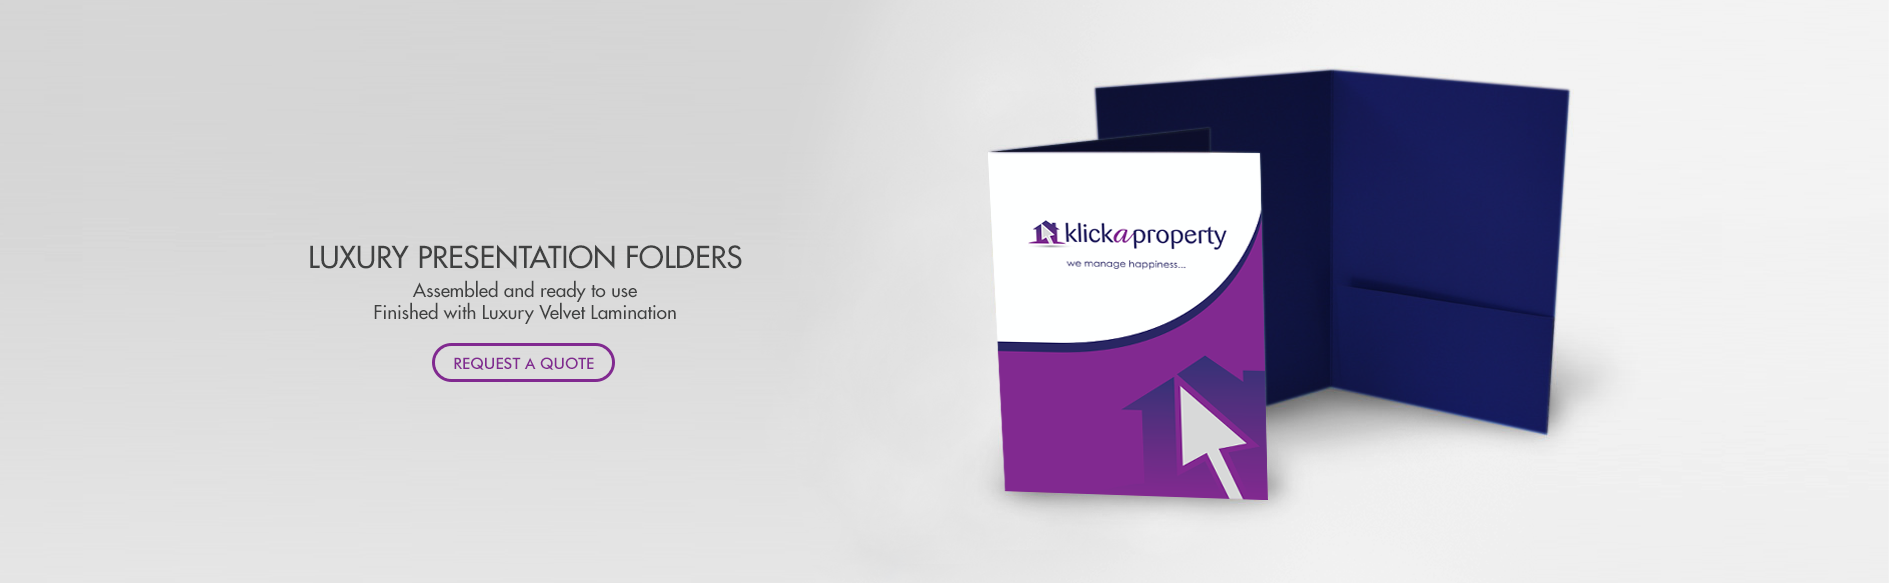 Presentation-Folder-_Slider.21